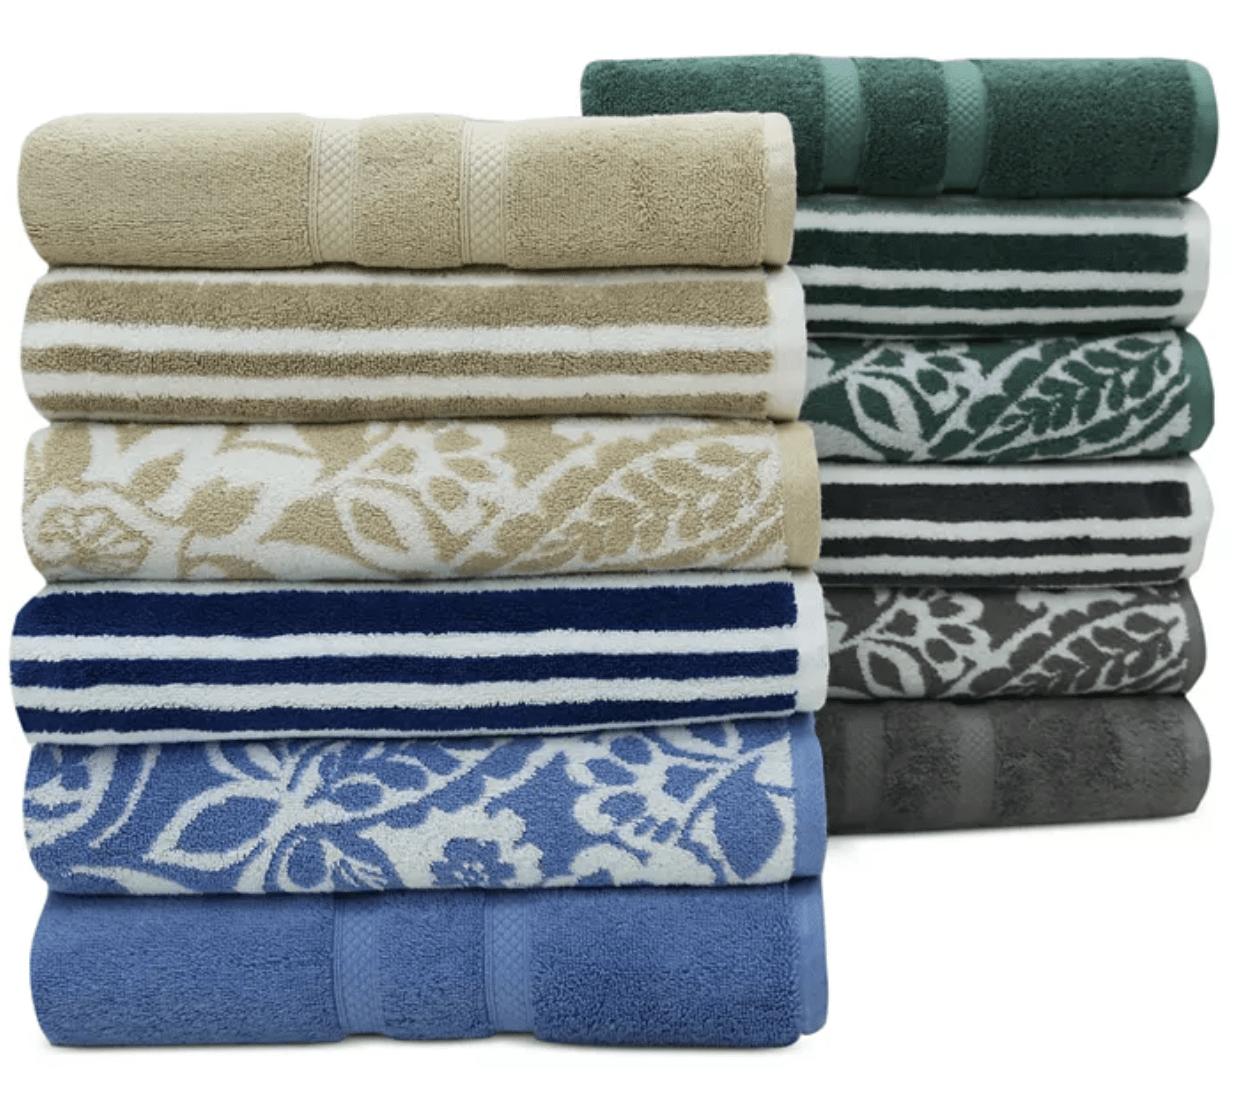 Charter Club Bath Towels